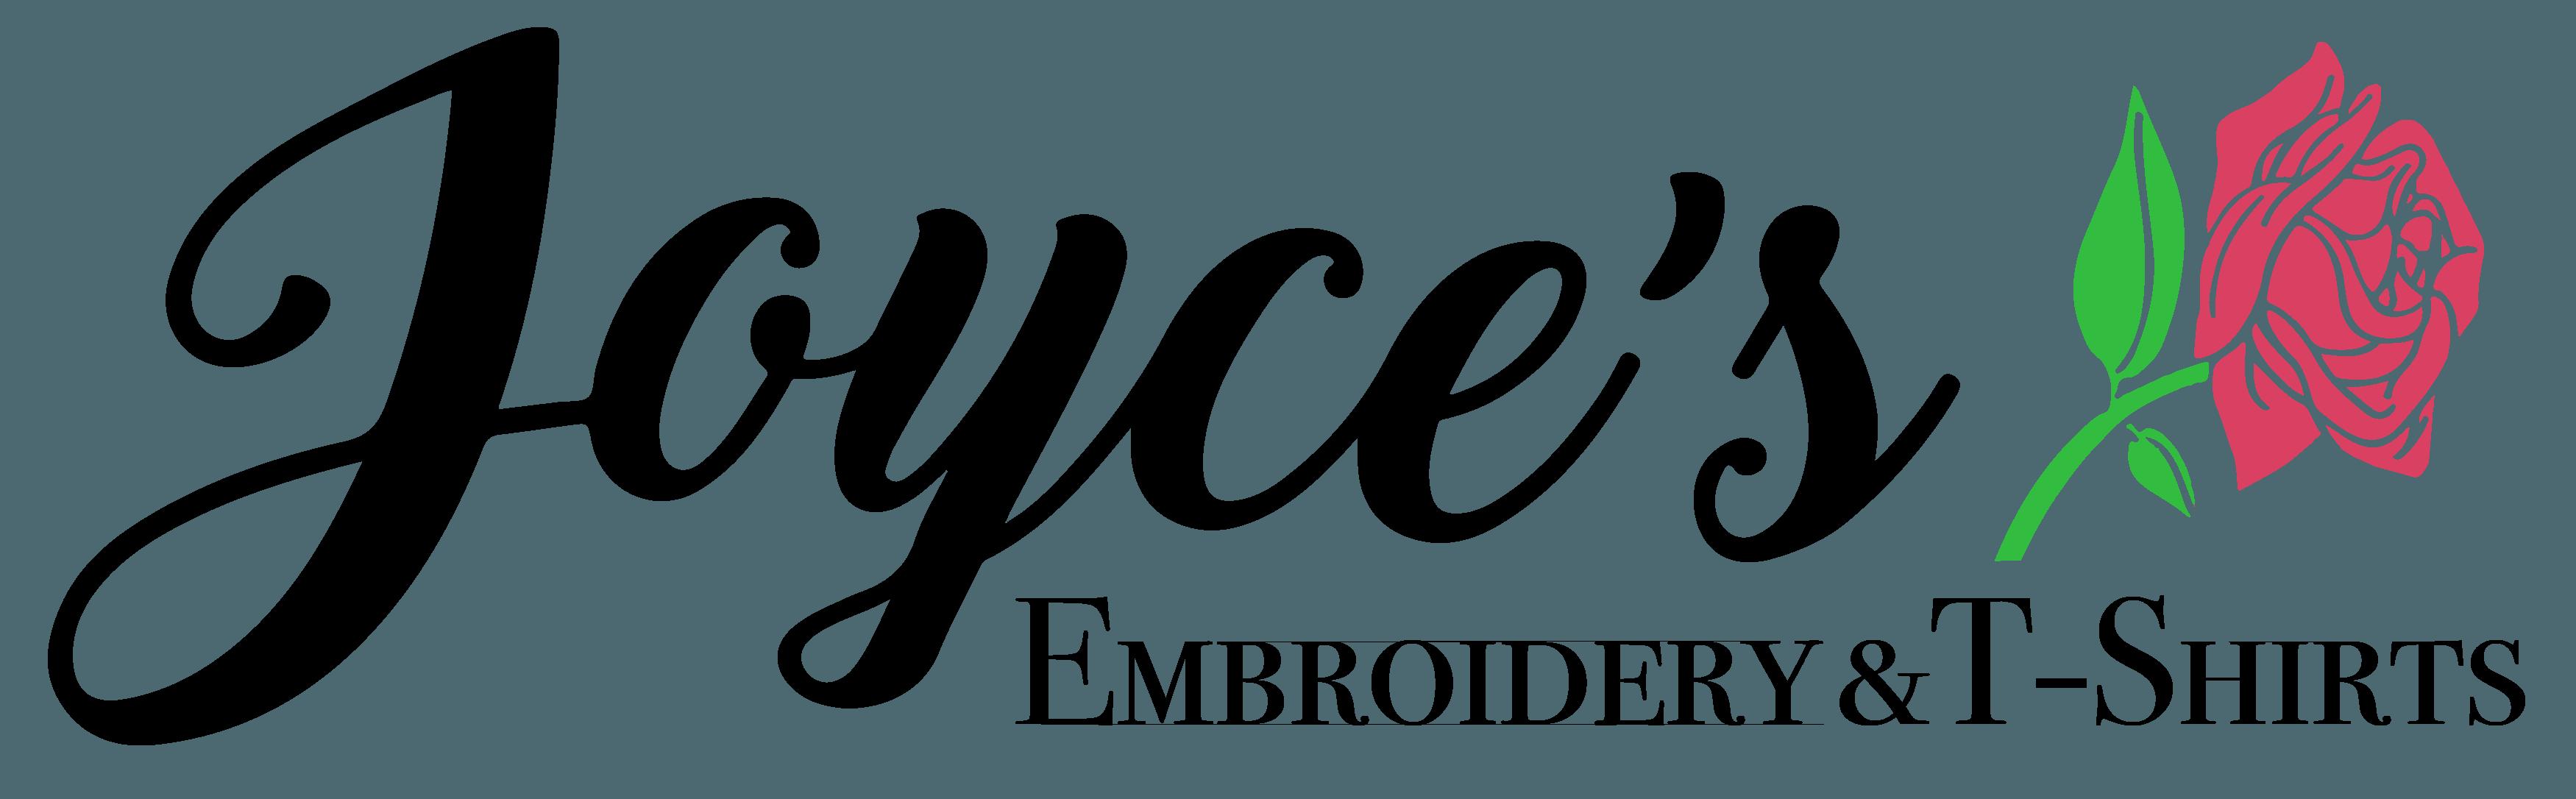 Joyces Embroidery